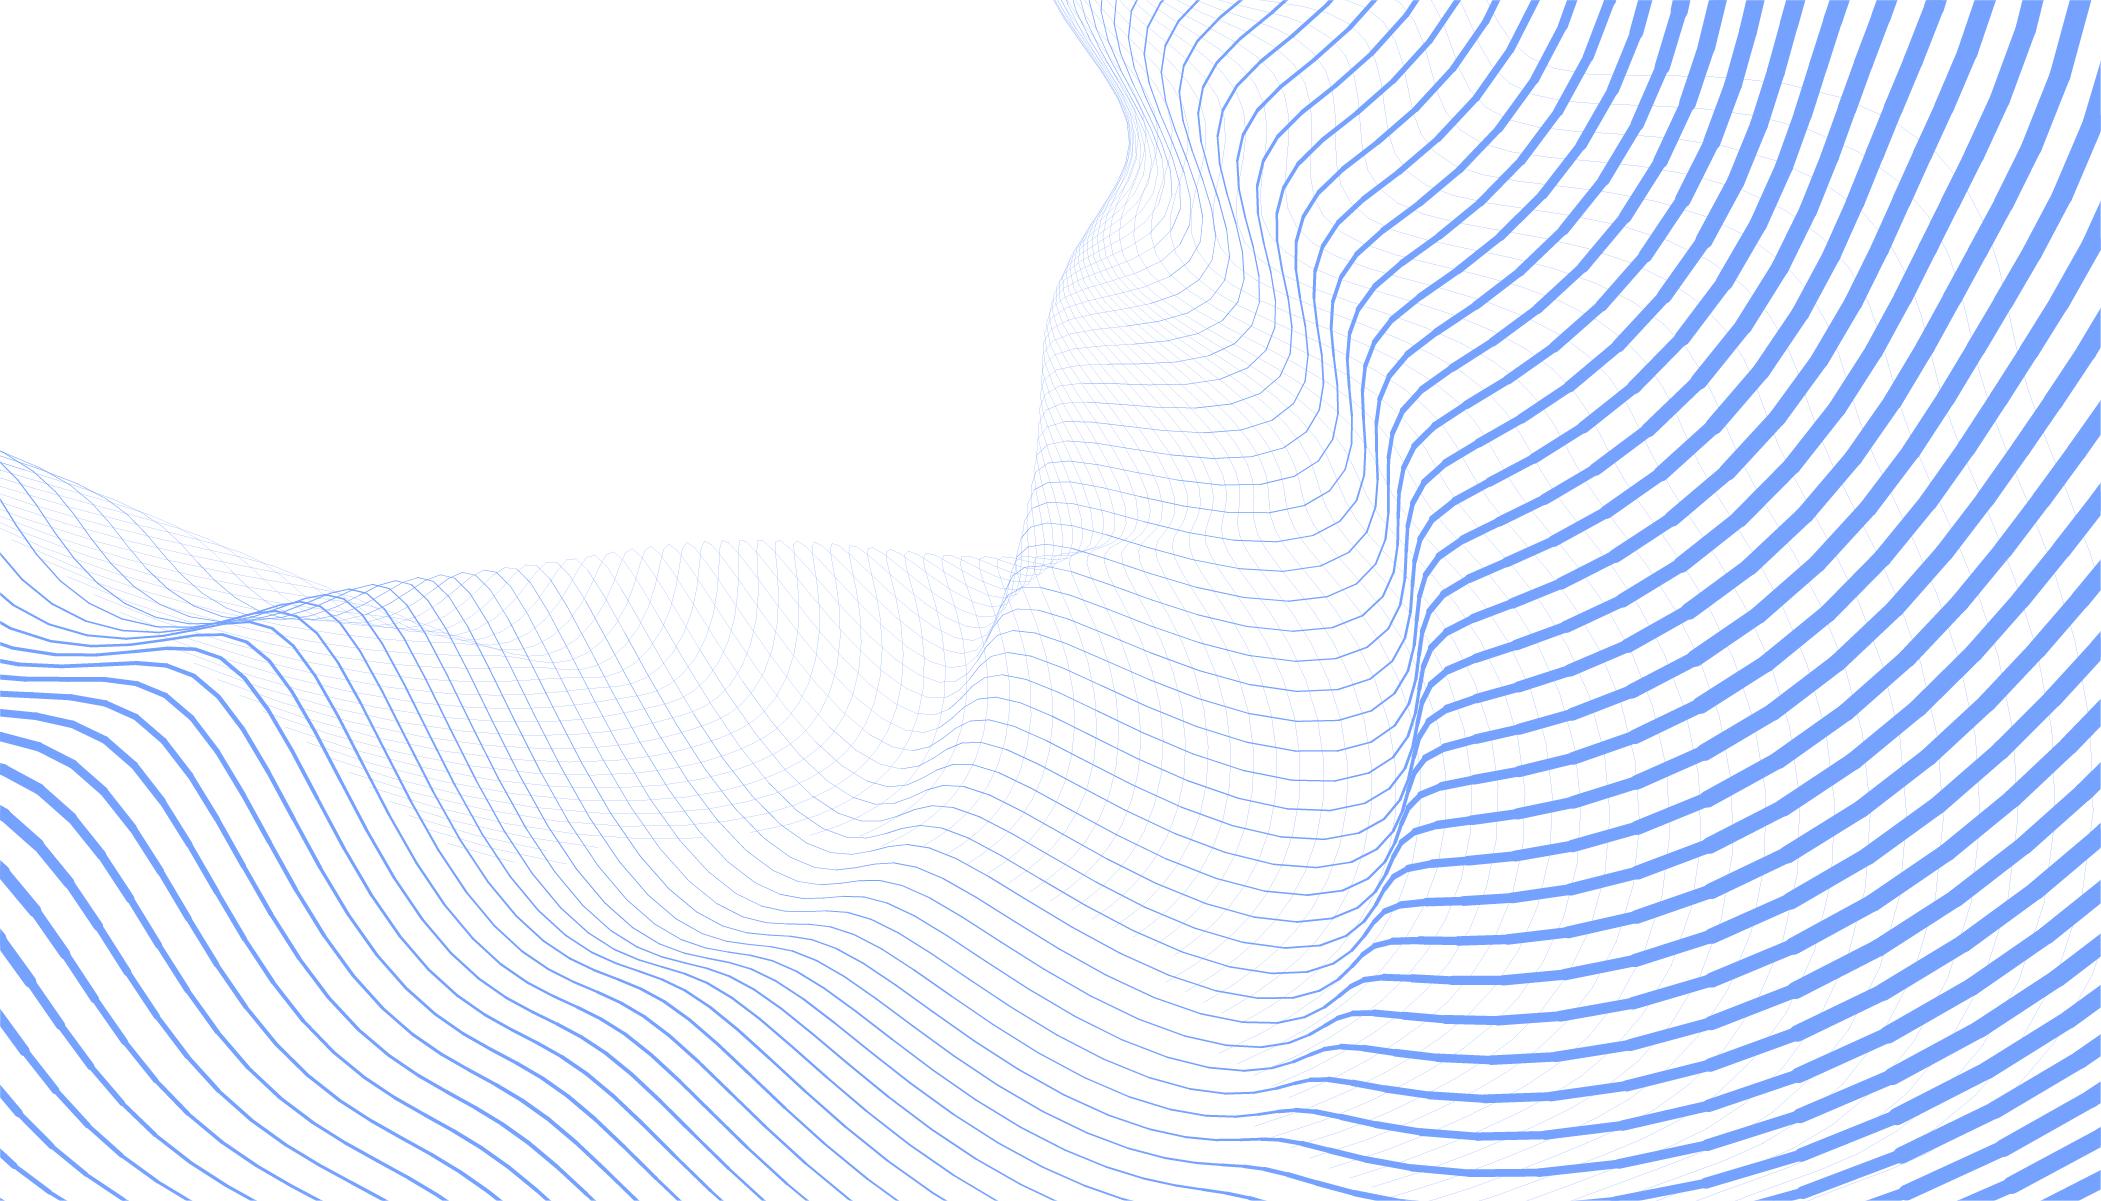 lines-bg-01.png